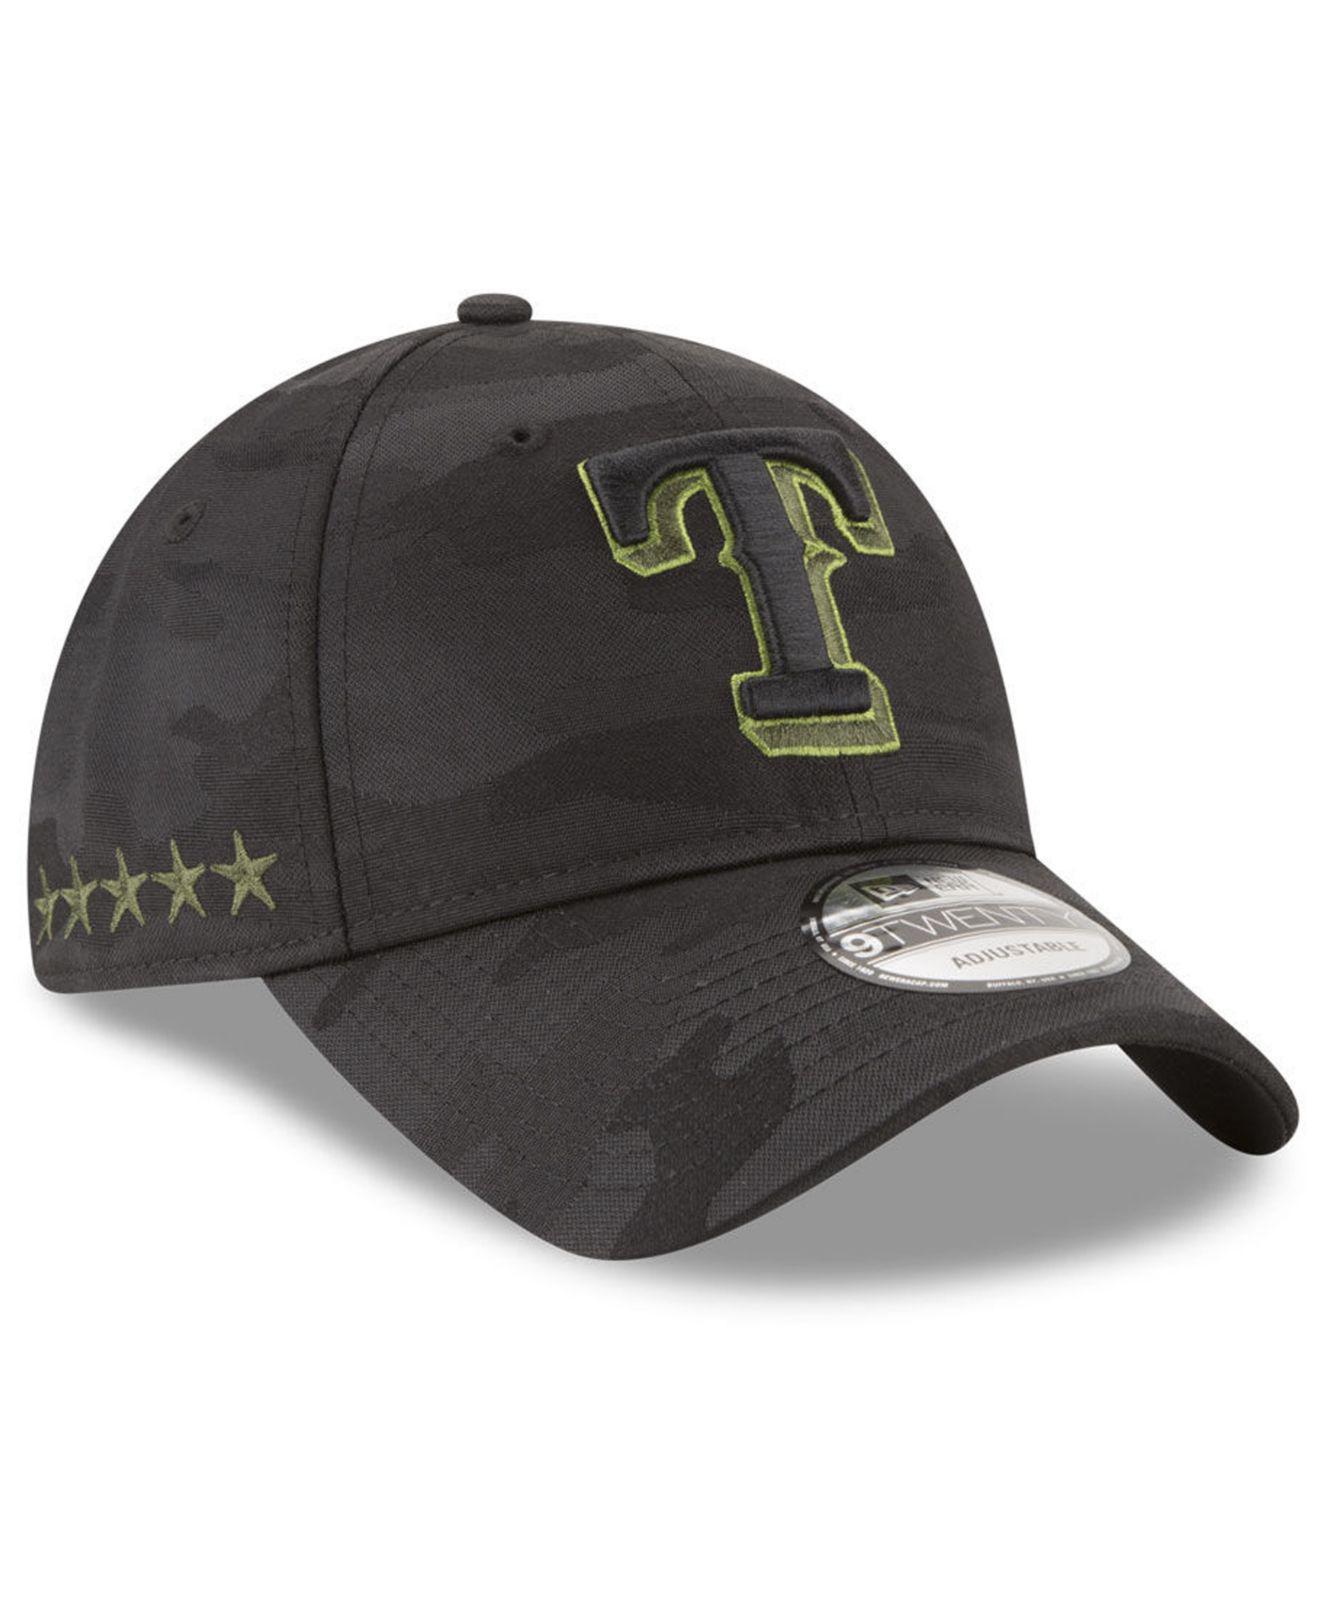 5f8f3822984 Lyst - KTZ Texas Rangers Memorial Day 9twenty Cap in Black for Men